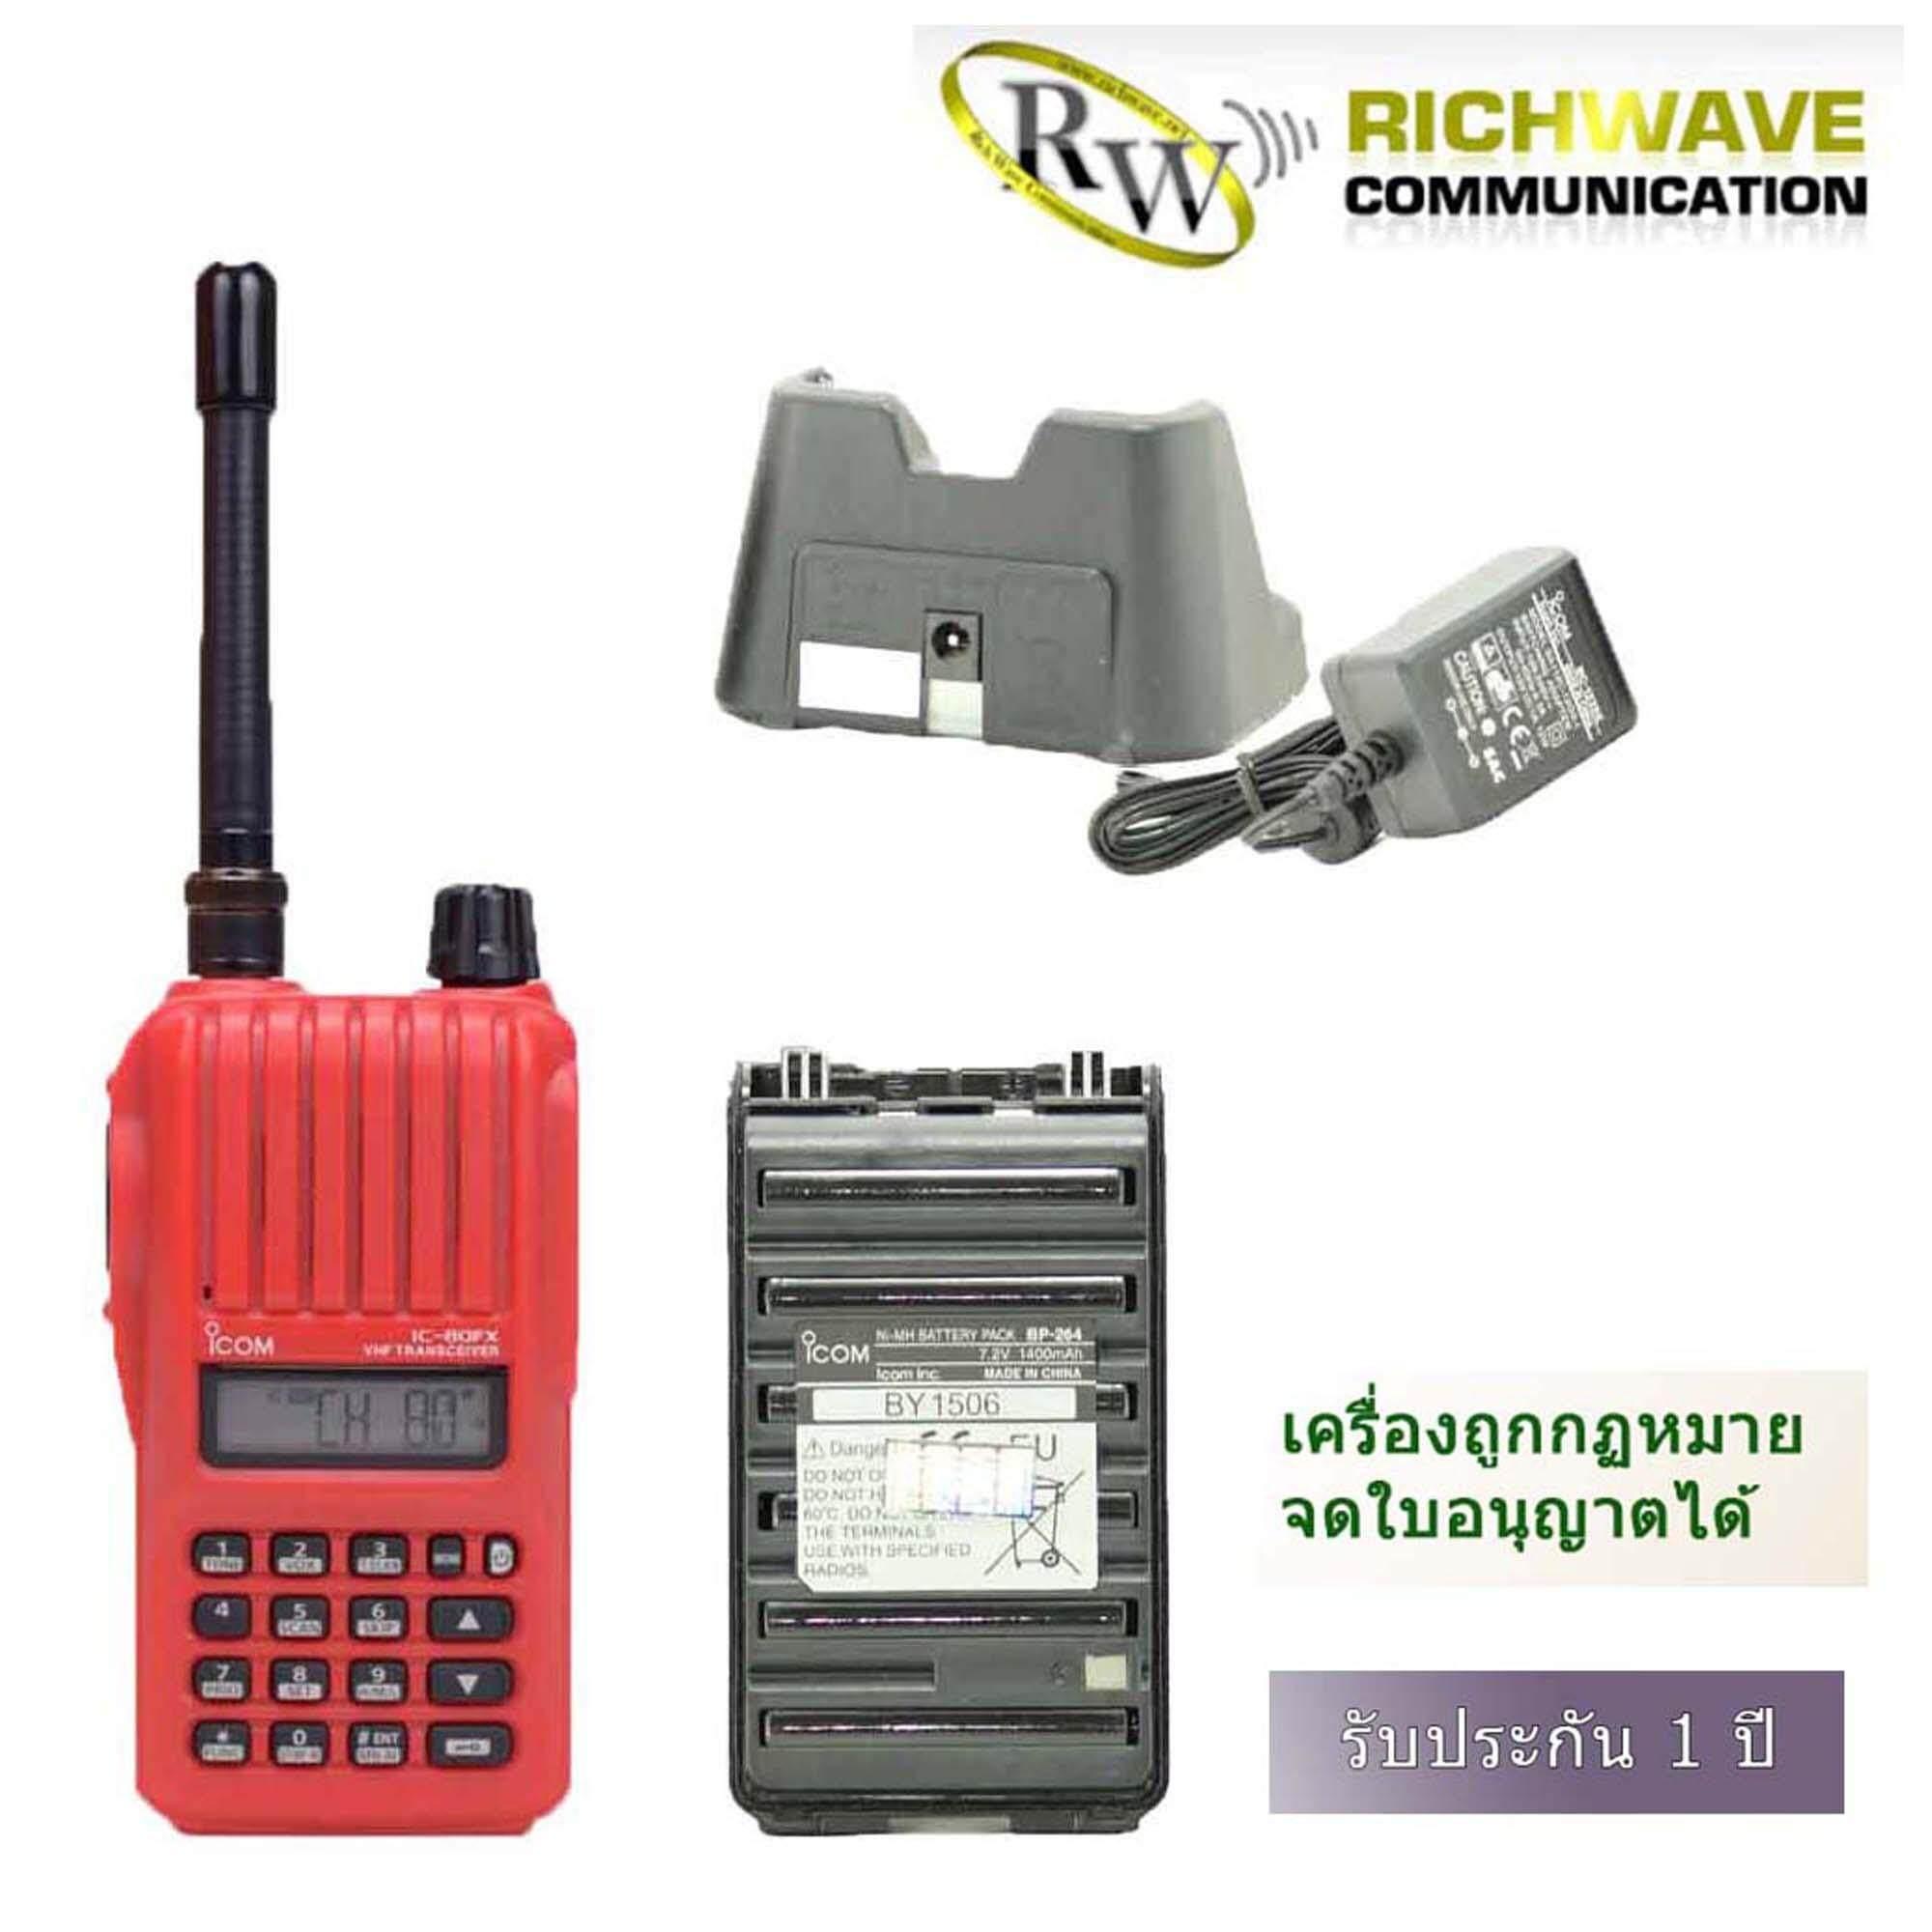 ICOM IC-80FX  วิทยุสื่อสาร แท้ทั้งชุด GSR แบตเตอรี่แท้ BP264 แท่นชาร์จแท้ BC191 อุปกรณ์ครบชุด ถูกกฏหมาย จดใบอนุญาตได้